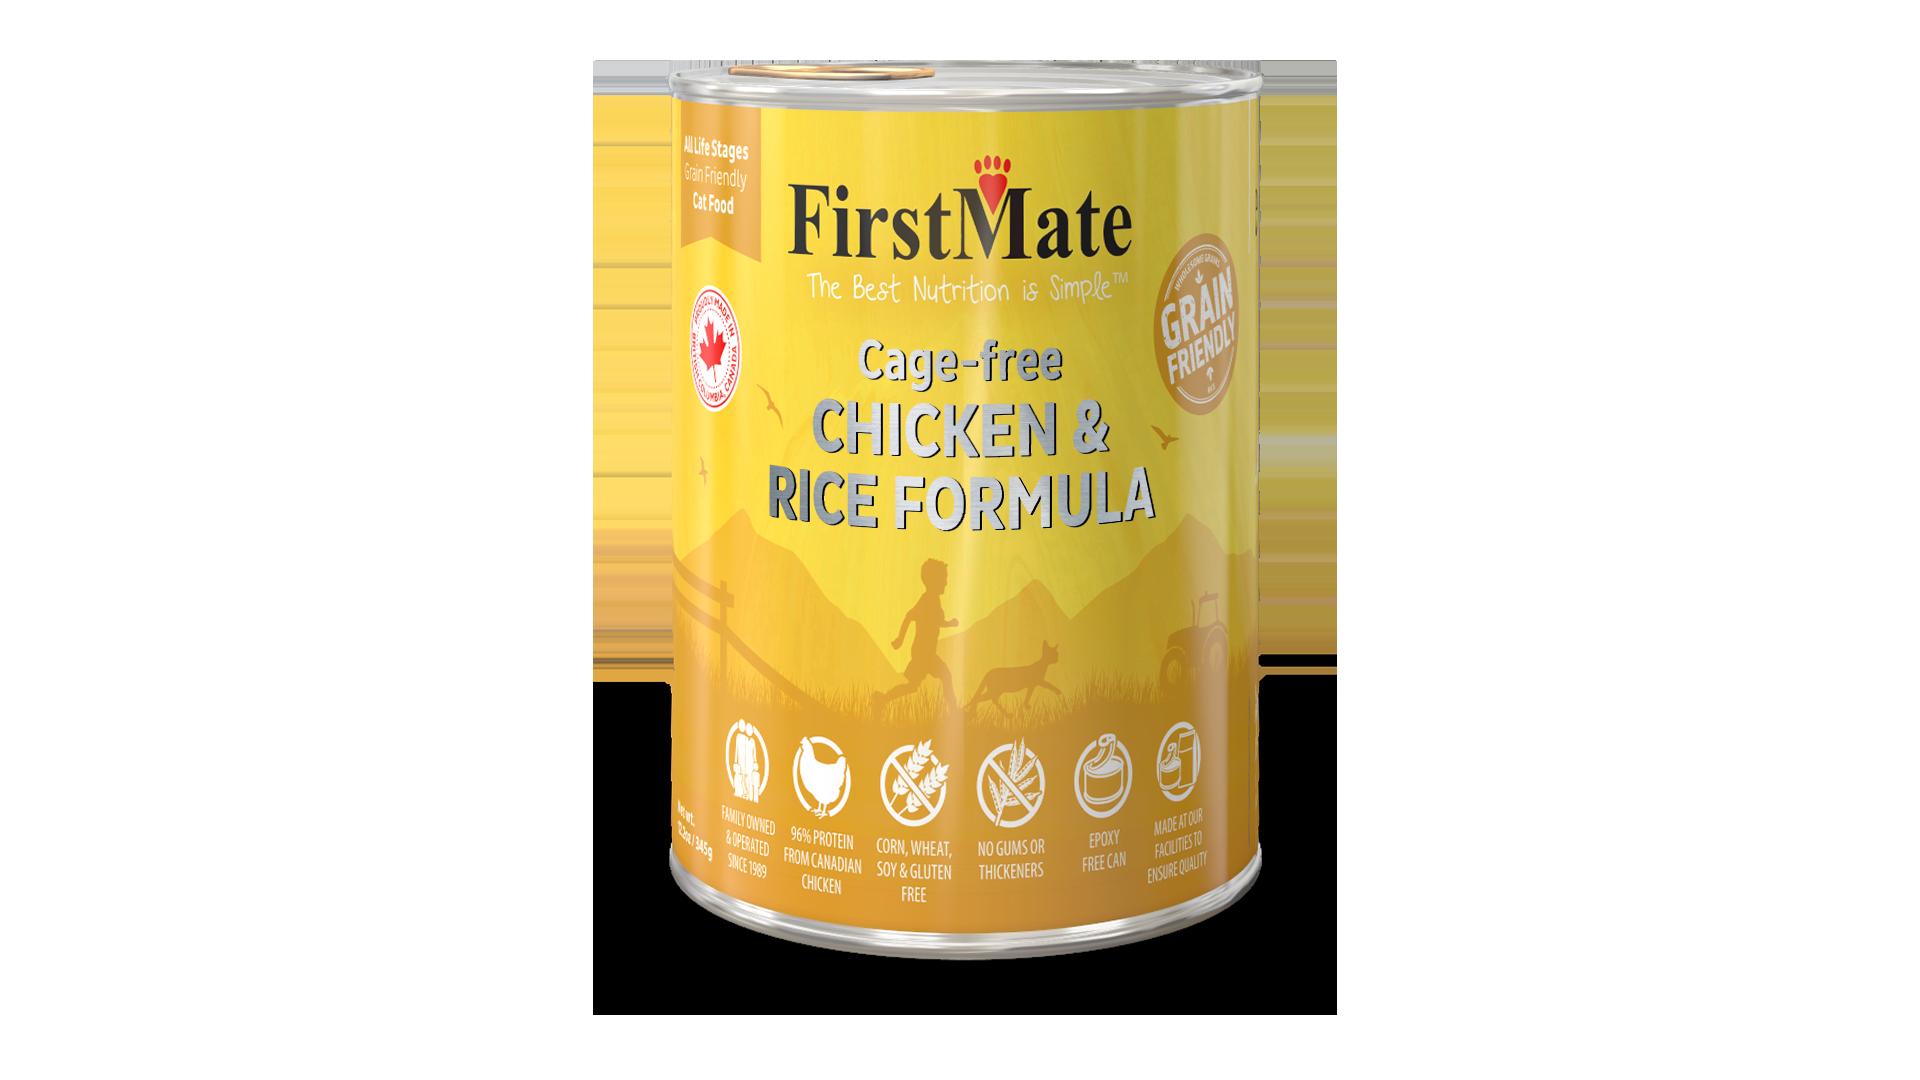 FirstMate FirstMate Grain Friendly Chicken & Rice Wet Cat Food